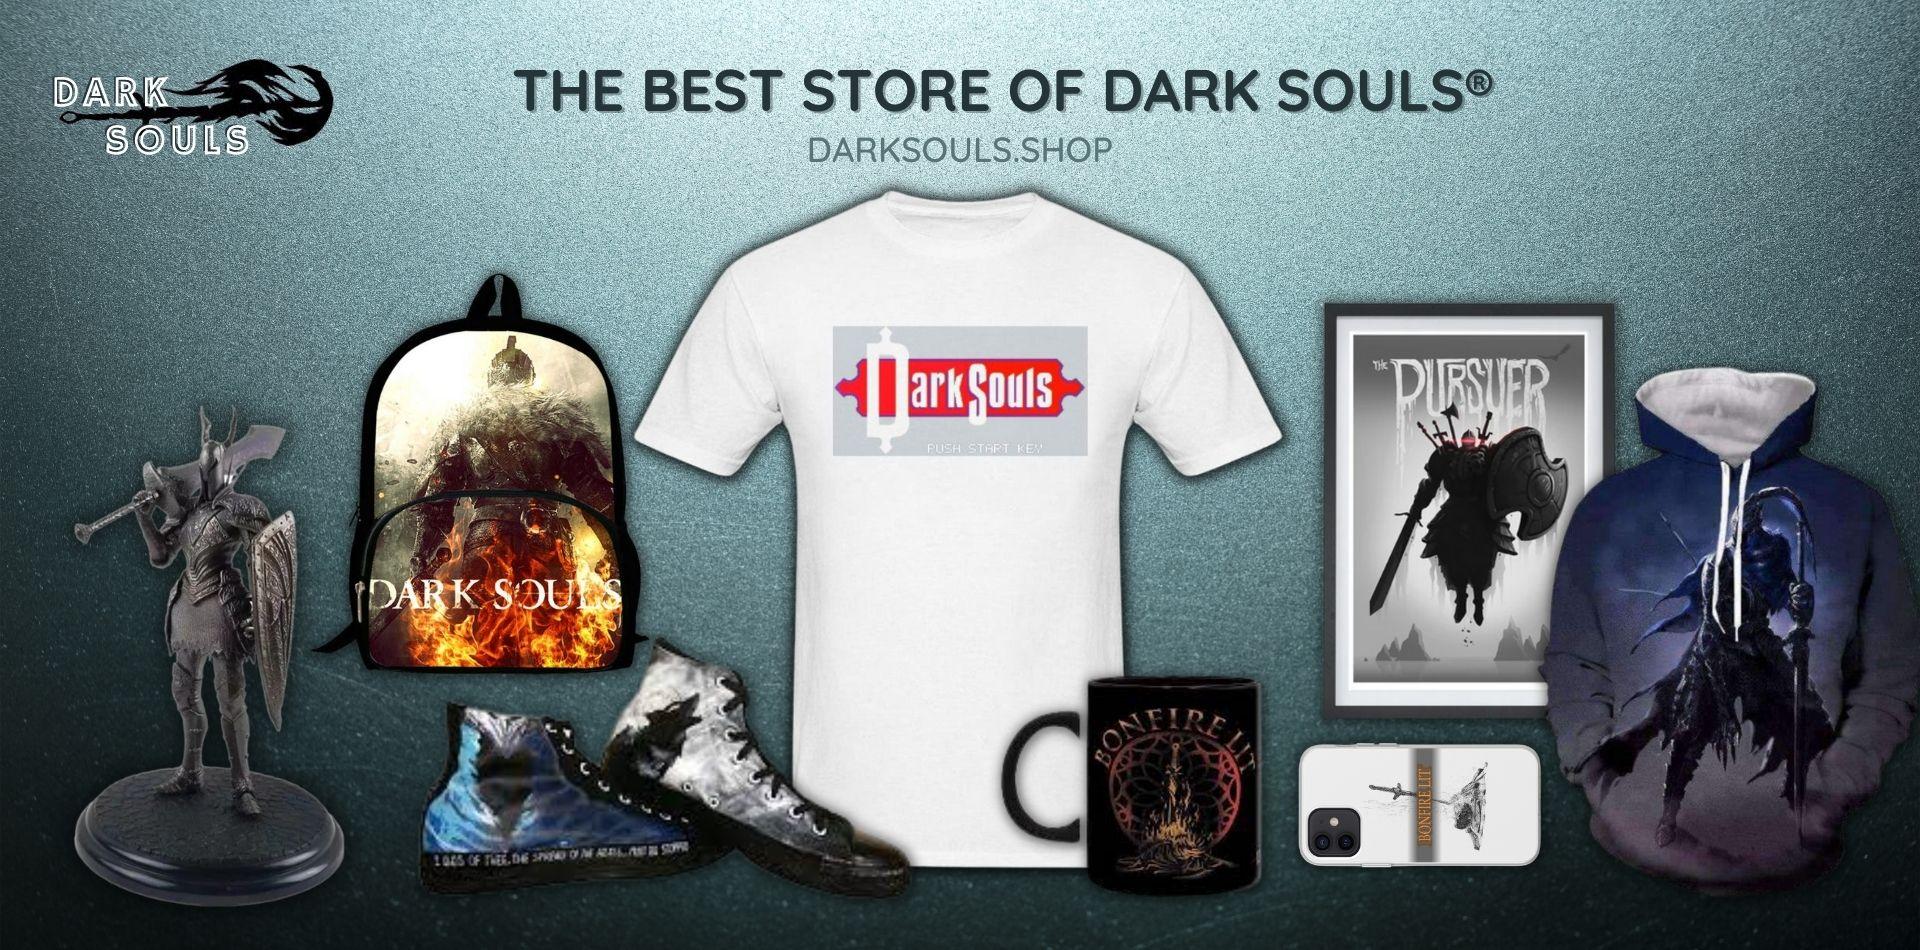 Dark Soul Store Web Banner 1920x950px 1 - Dark Souls Shop